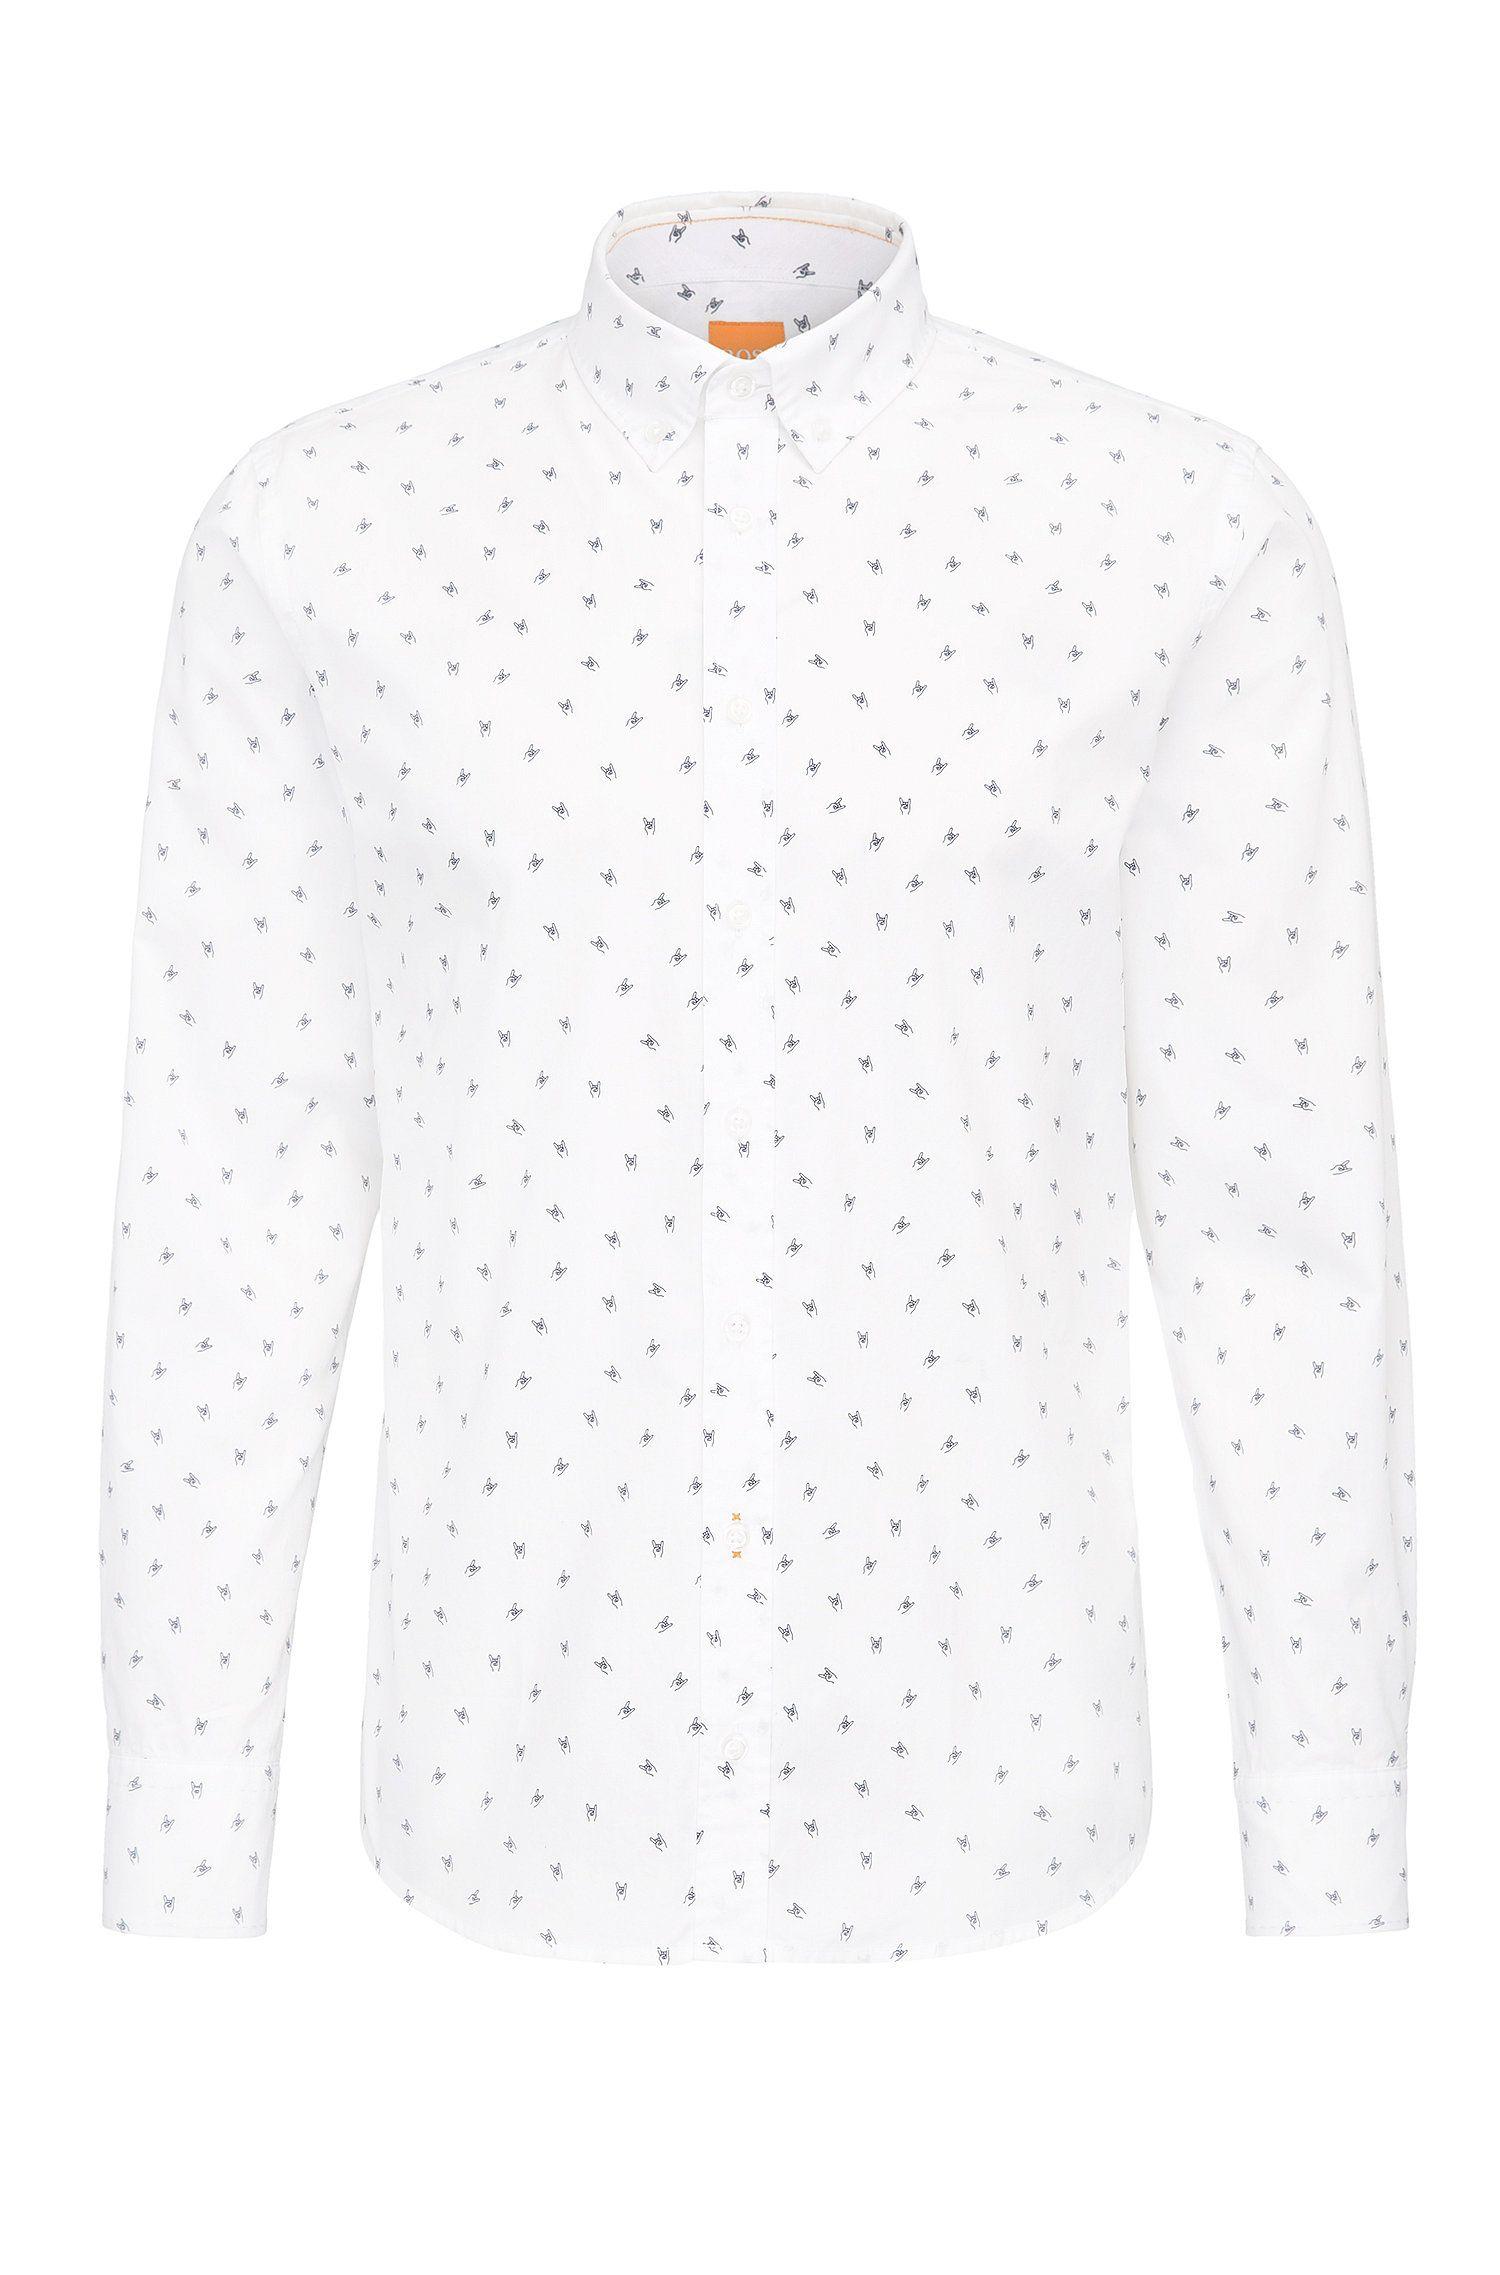 'Epreppy' | Slim Fit, Printed Cotton Button-Down Shirt